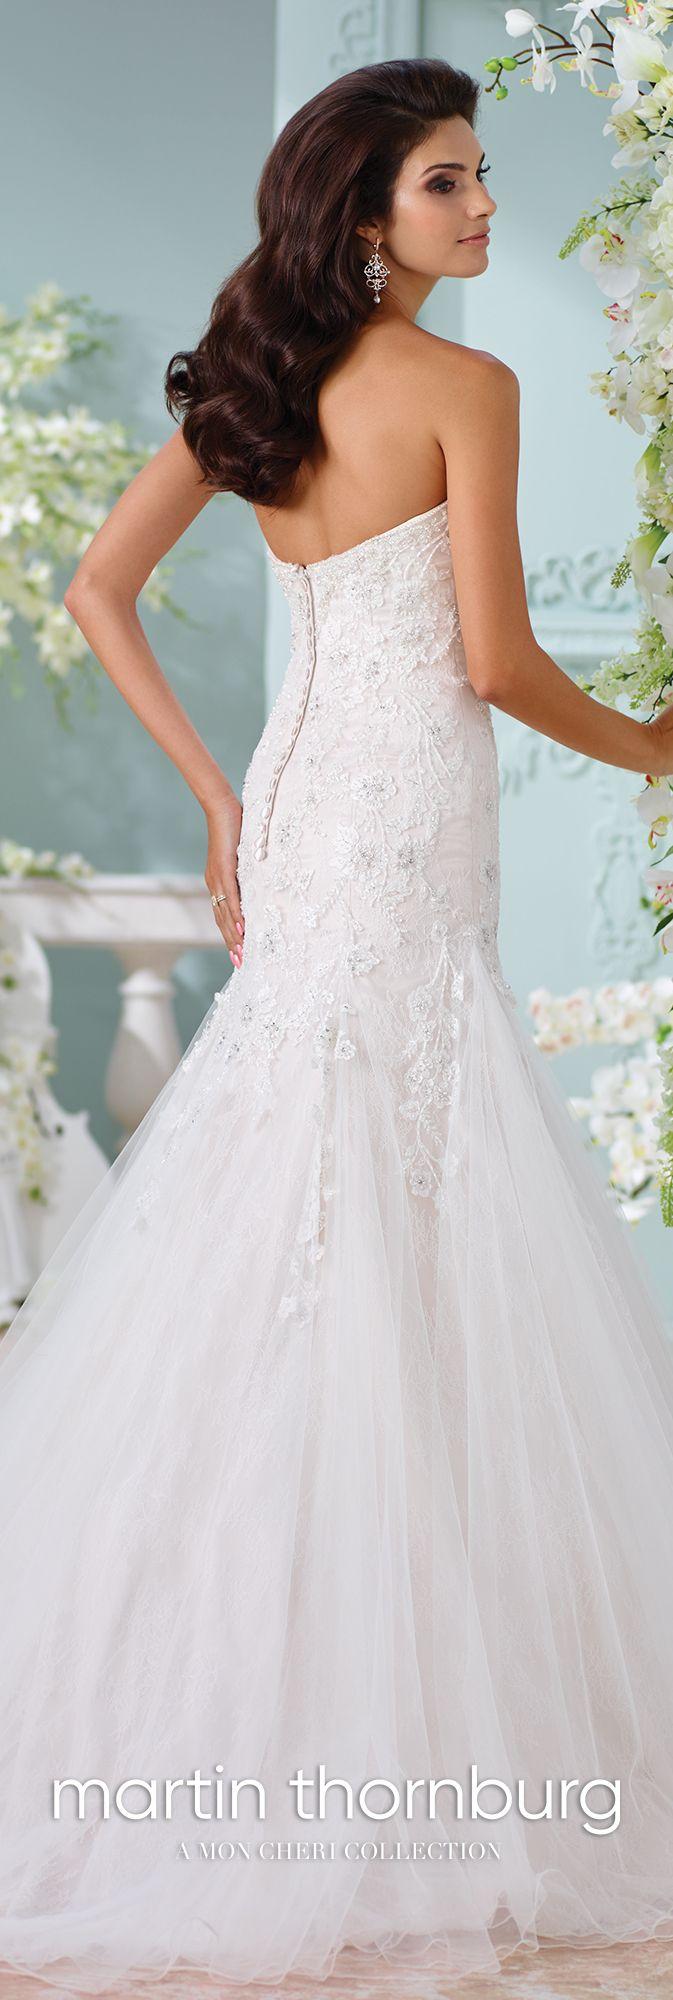 Chantilly lace embroidered trumpet wedding dress lita